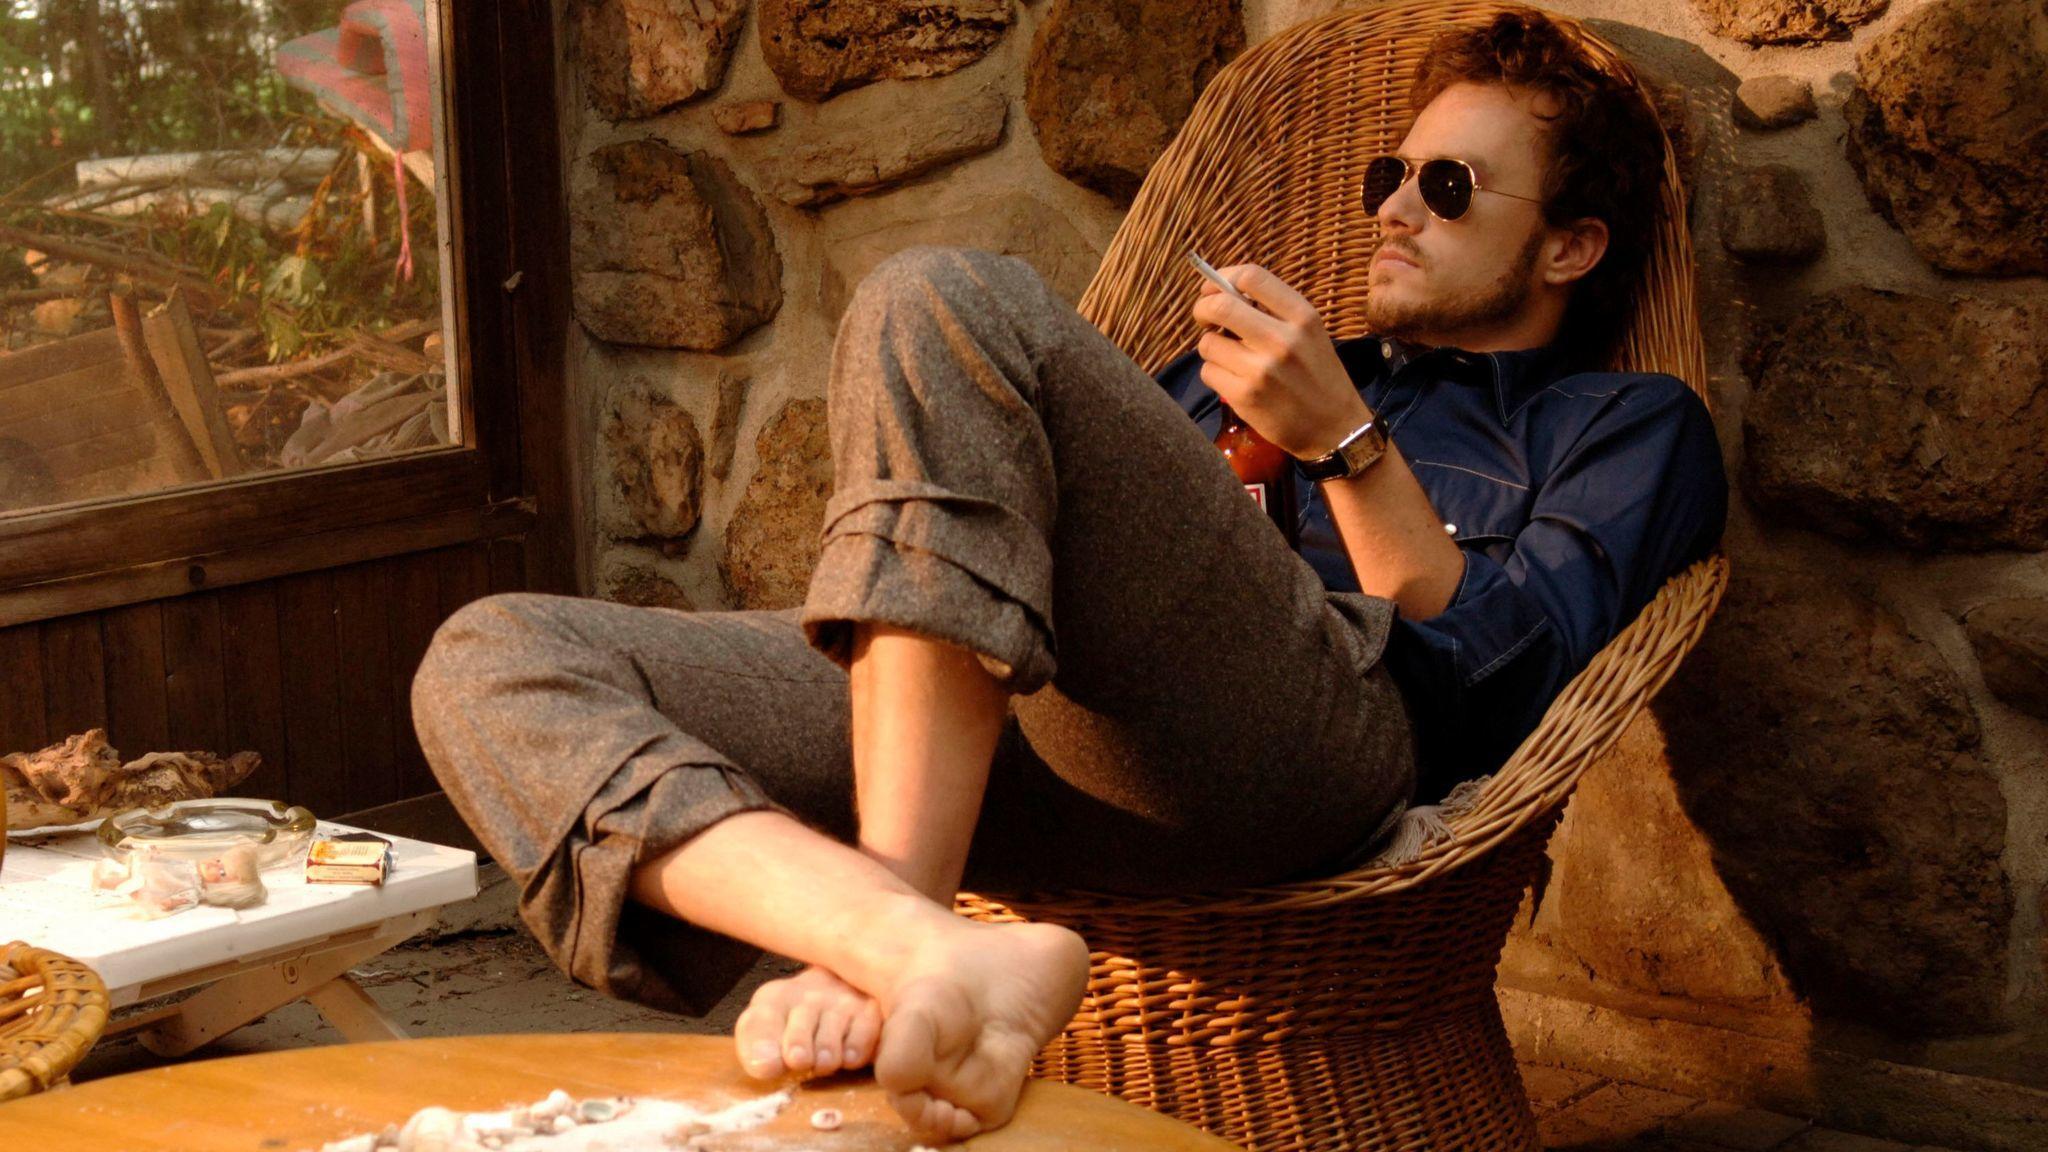 Heath Ledger in director Todd Haynes' movie